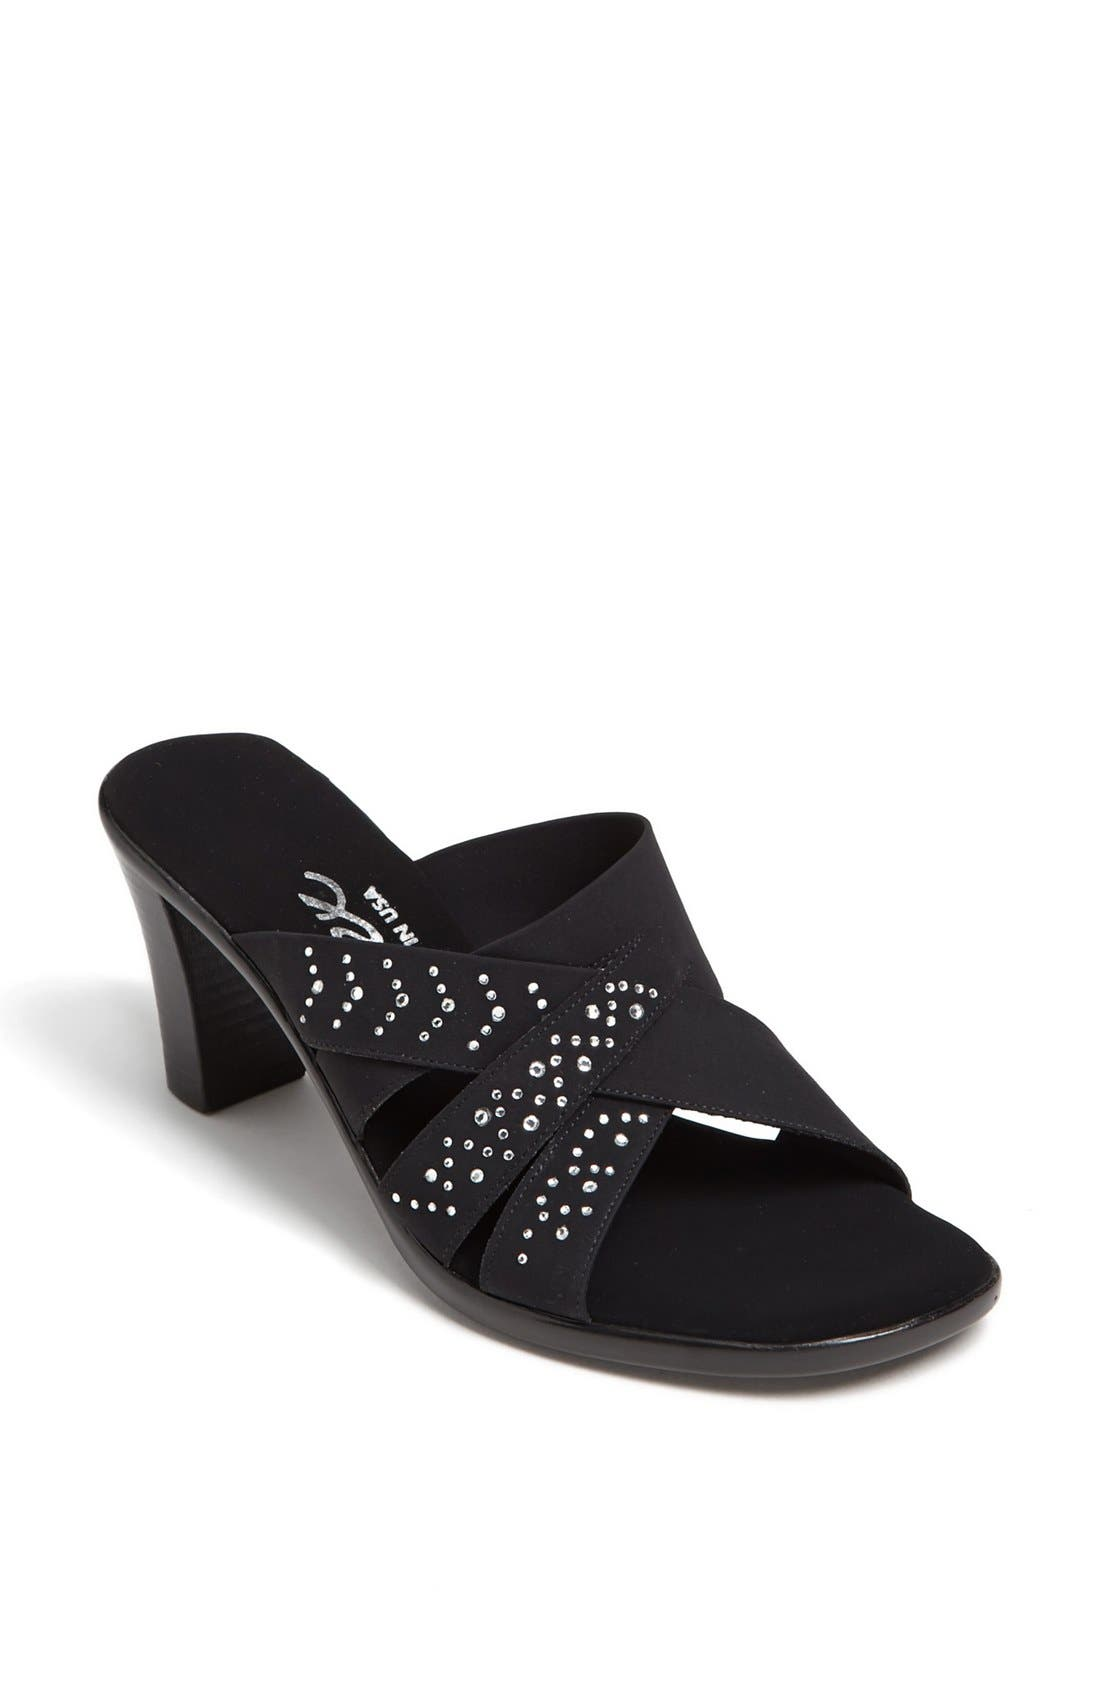 Main Image - Onex 'Georgia' Sandal